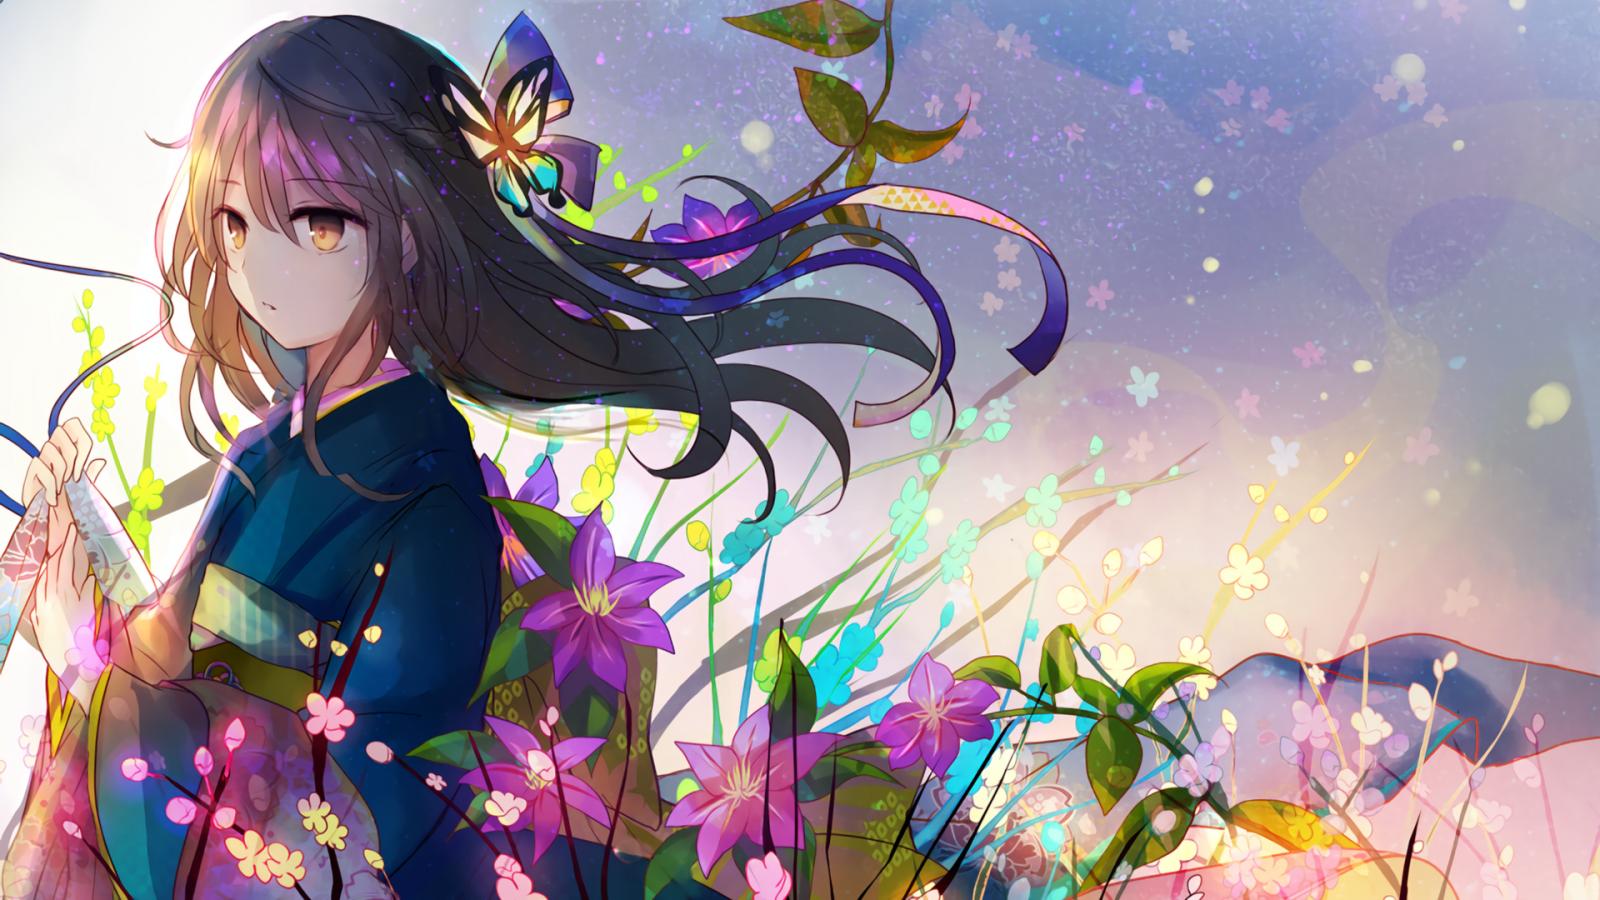 Fond d'écran : illustration, Anime, Manga, ART, Couleur, fleur 1920x1080 - nightelf87 - 45577 ...